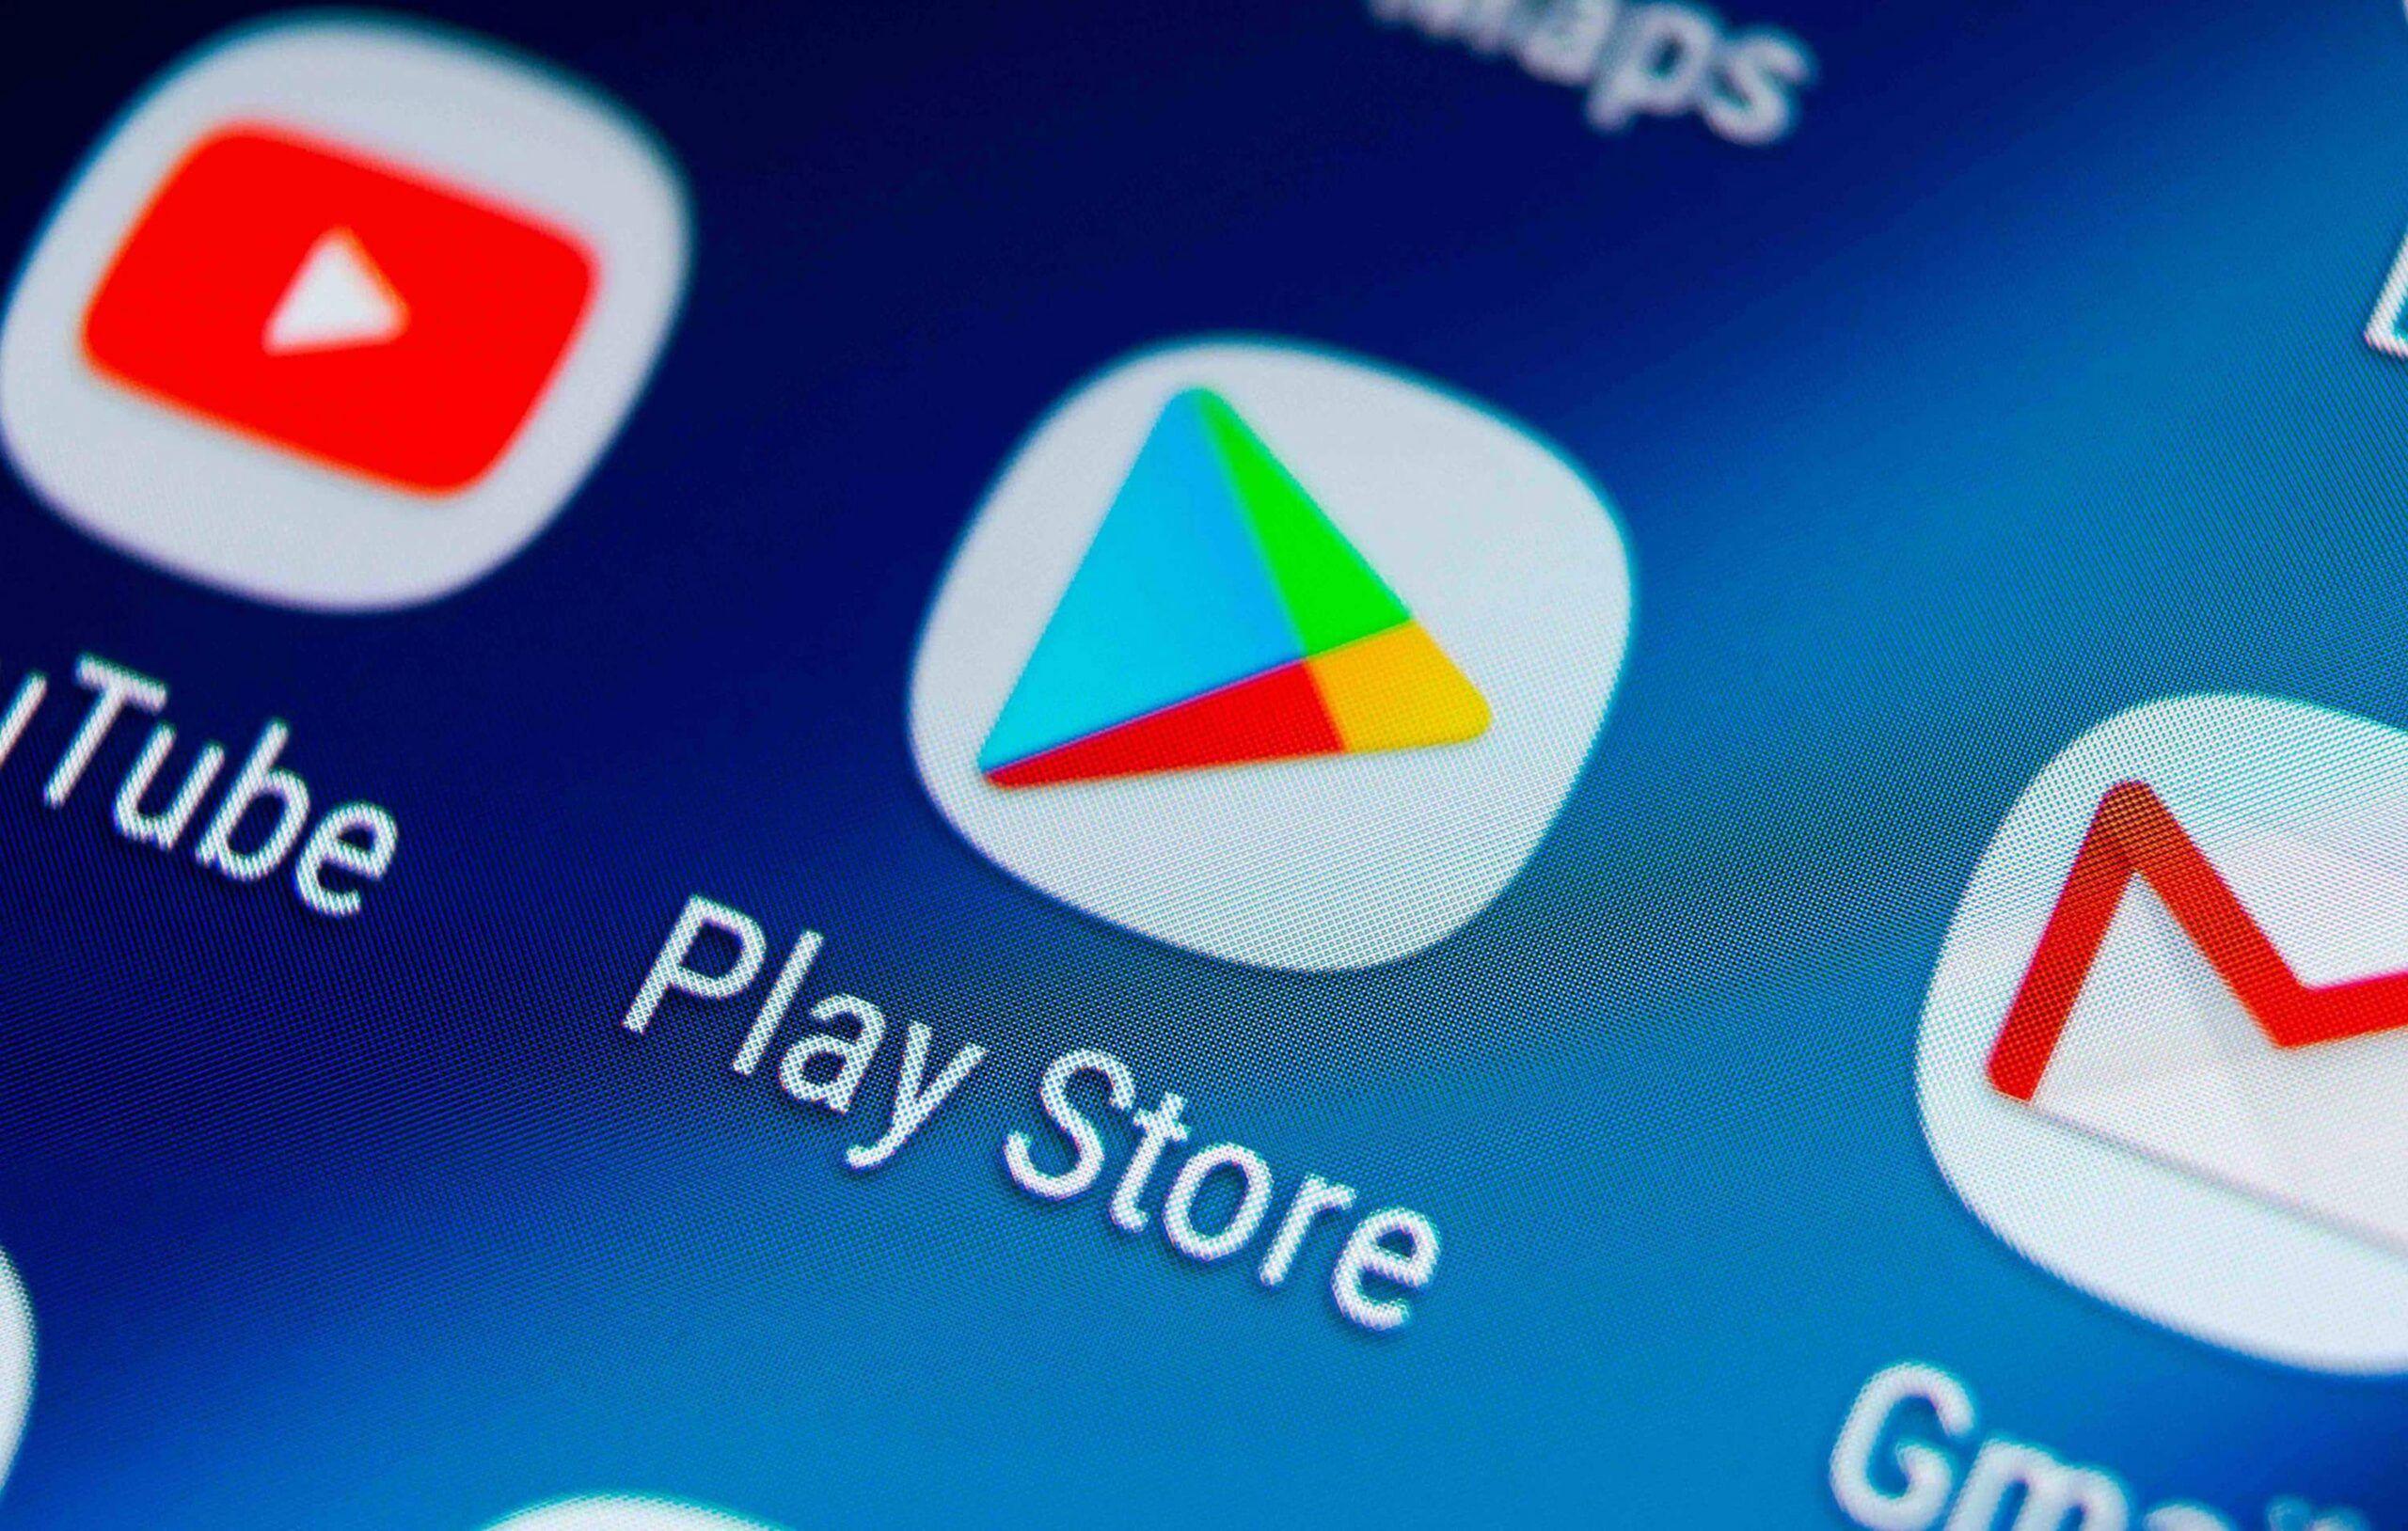 Memperbaiki masalah Google Play Store